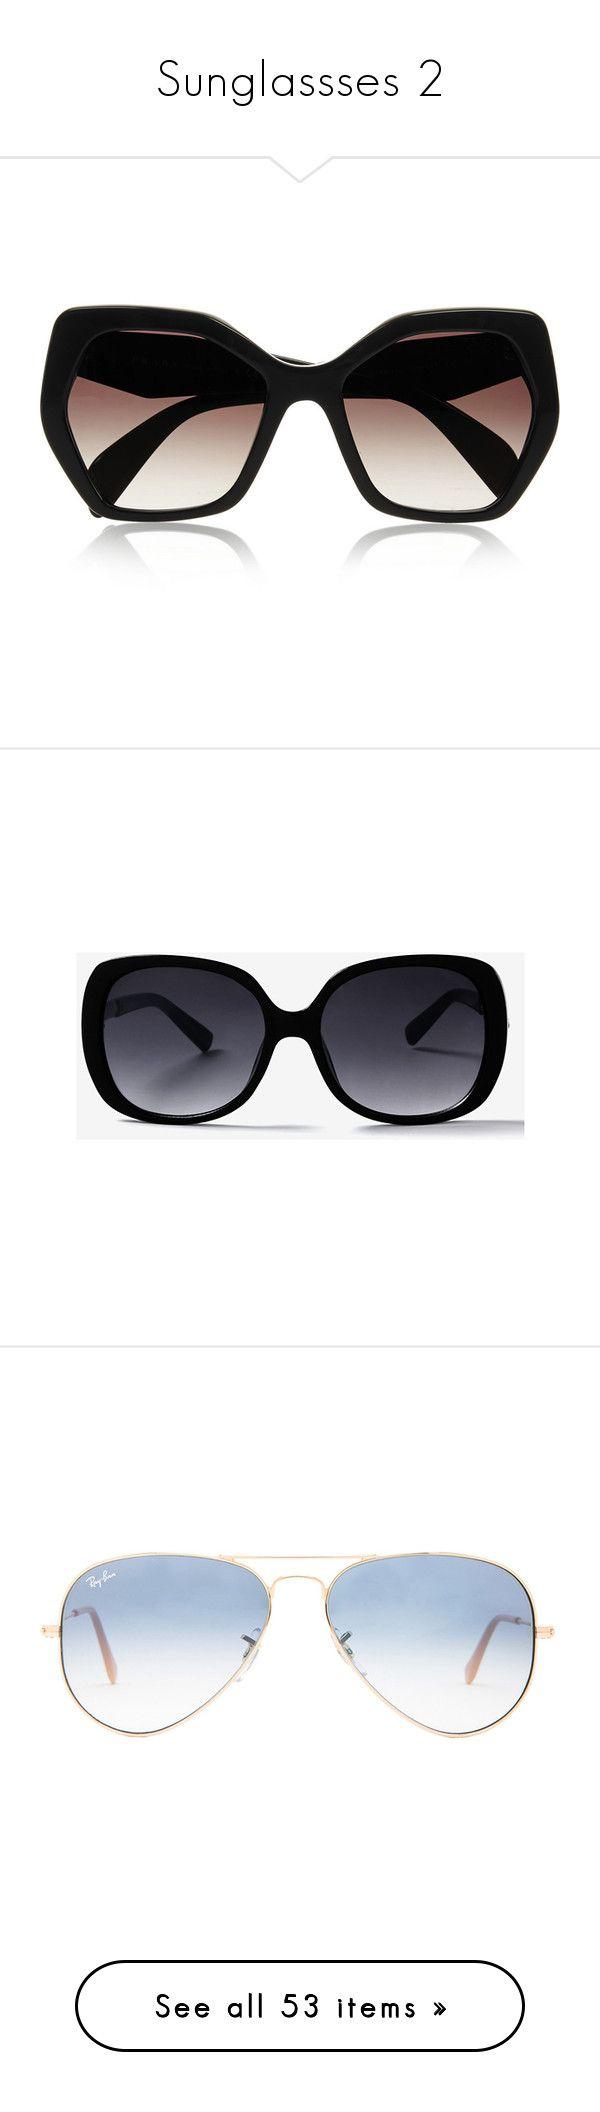 """Sunglassses 2"" by musicmelody1 ❤ liked on Polyvore featuring accessories, eyewear, sunglasses, glasses, prada, black, uv protection sunglasses, prada glasses, hexagon sunglasses and hexagon glasses"